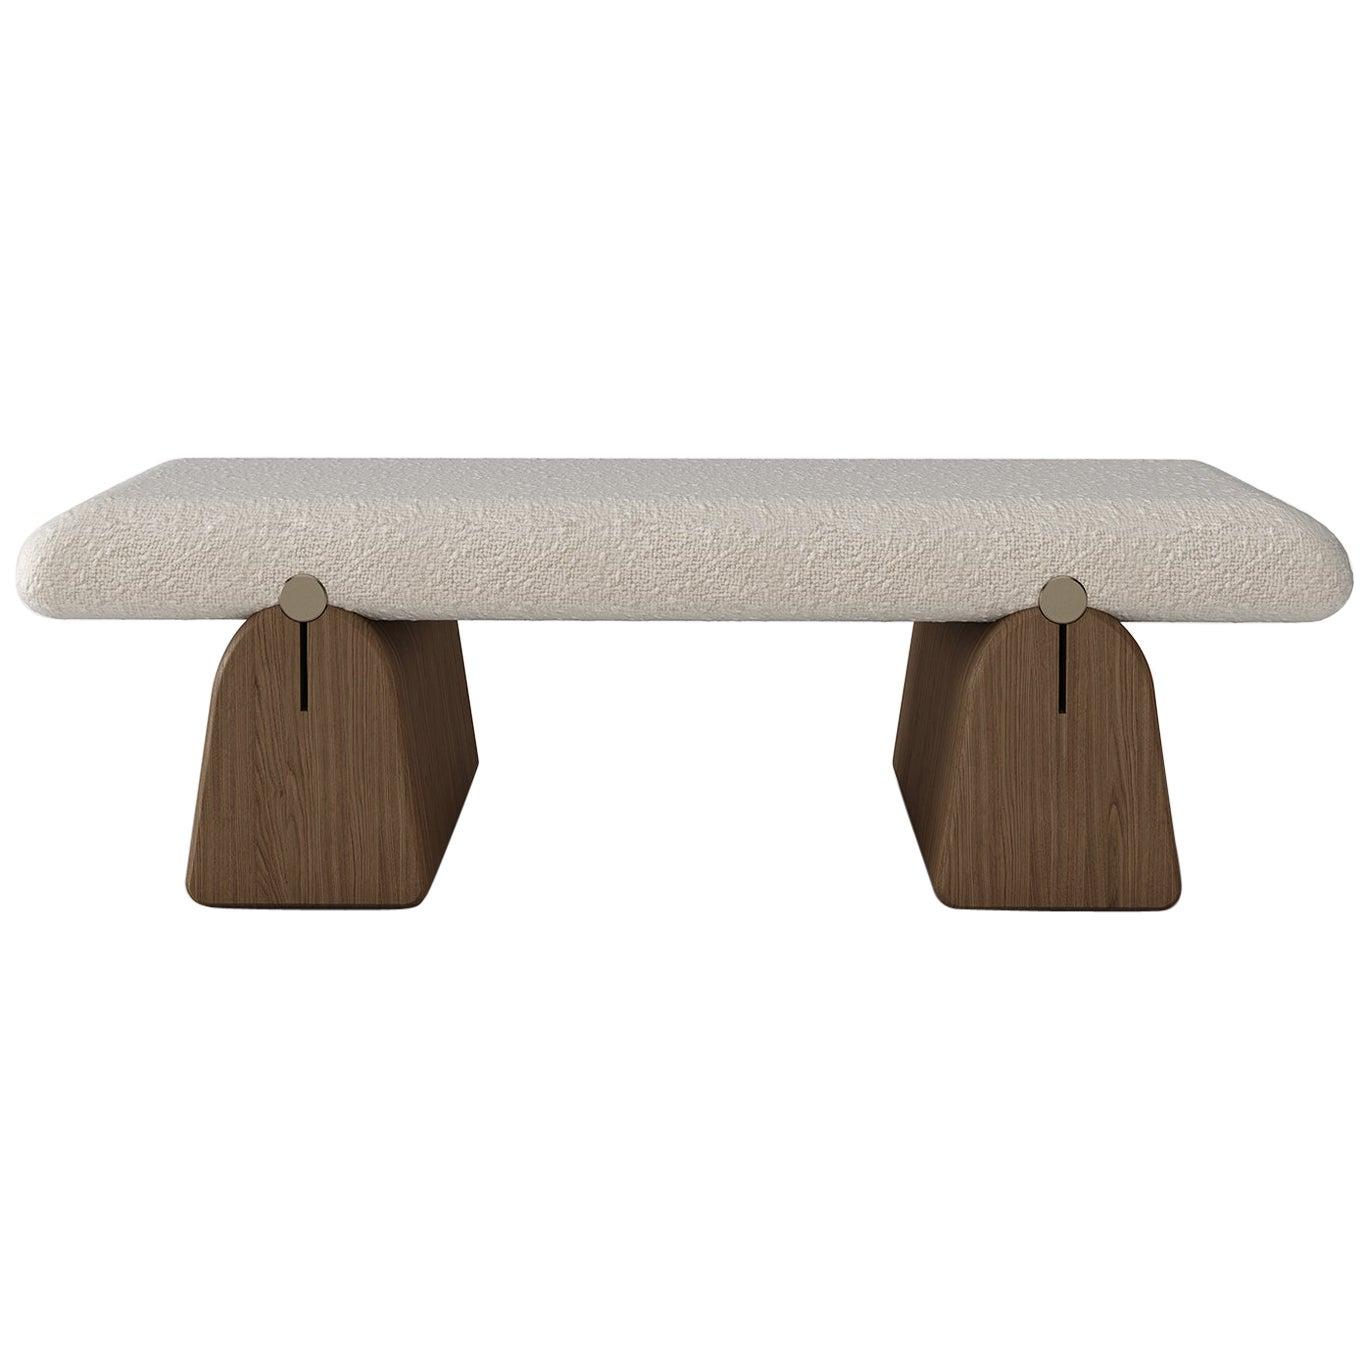 IO Bench by Buket Hoscan Bazman, Bouclé, Brass, Oak, Furniture